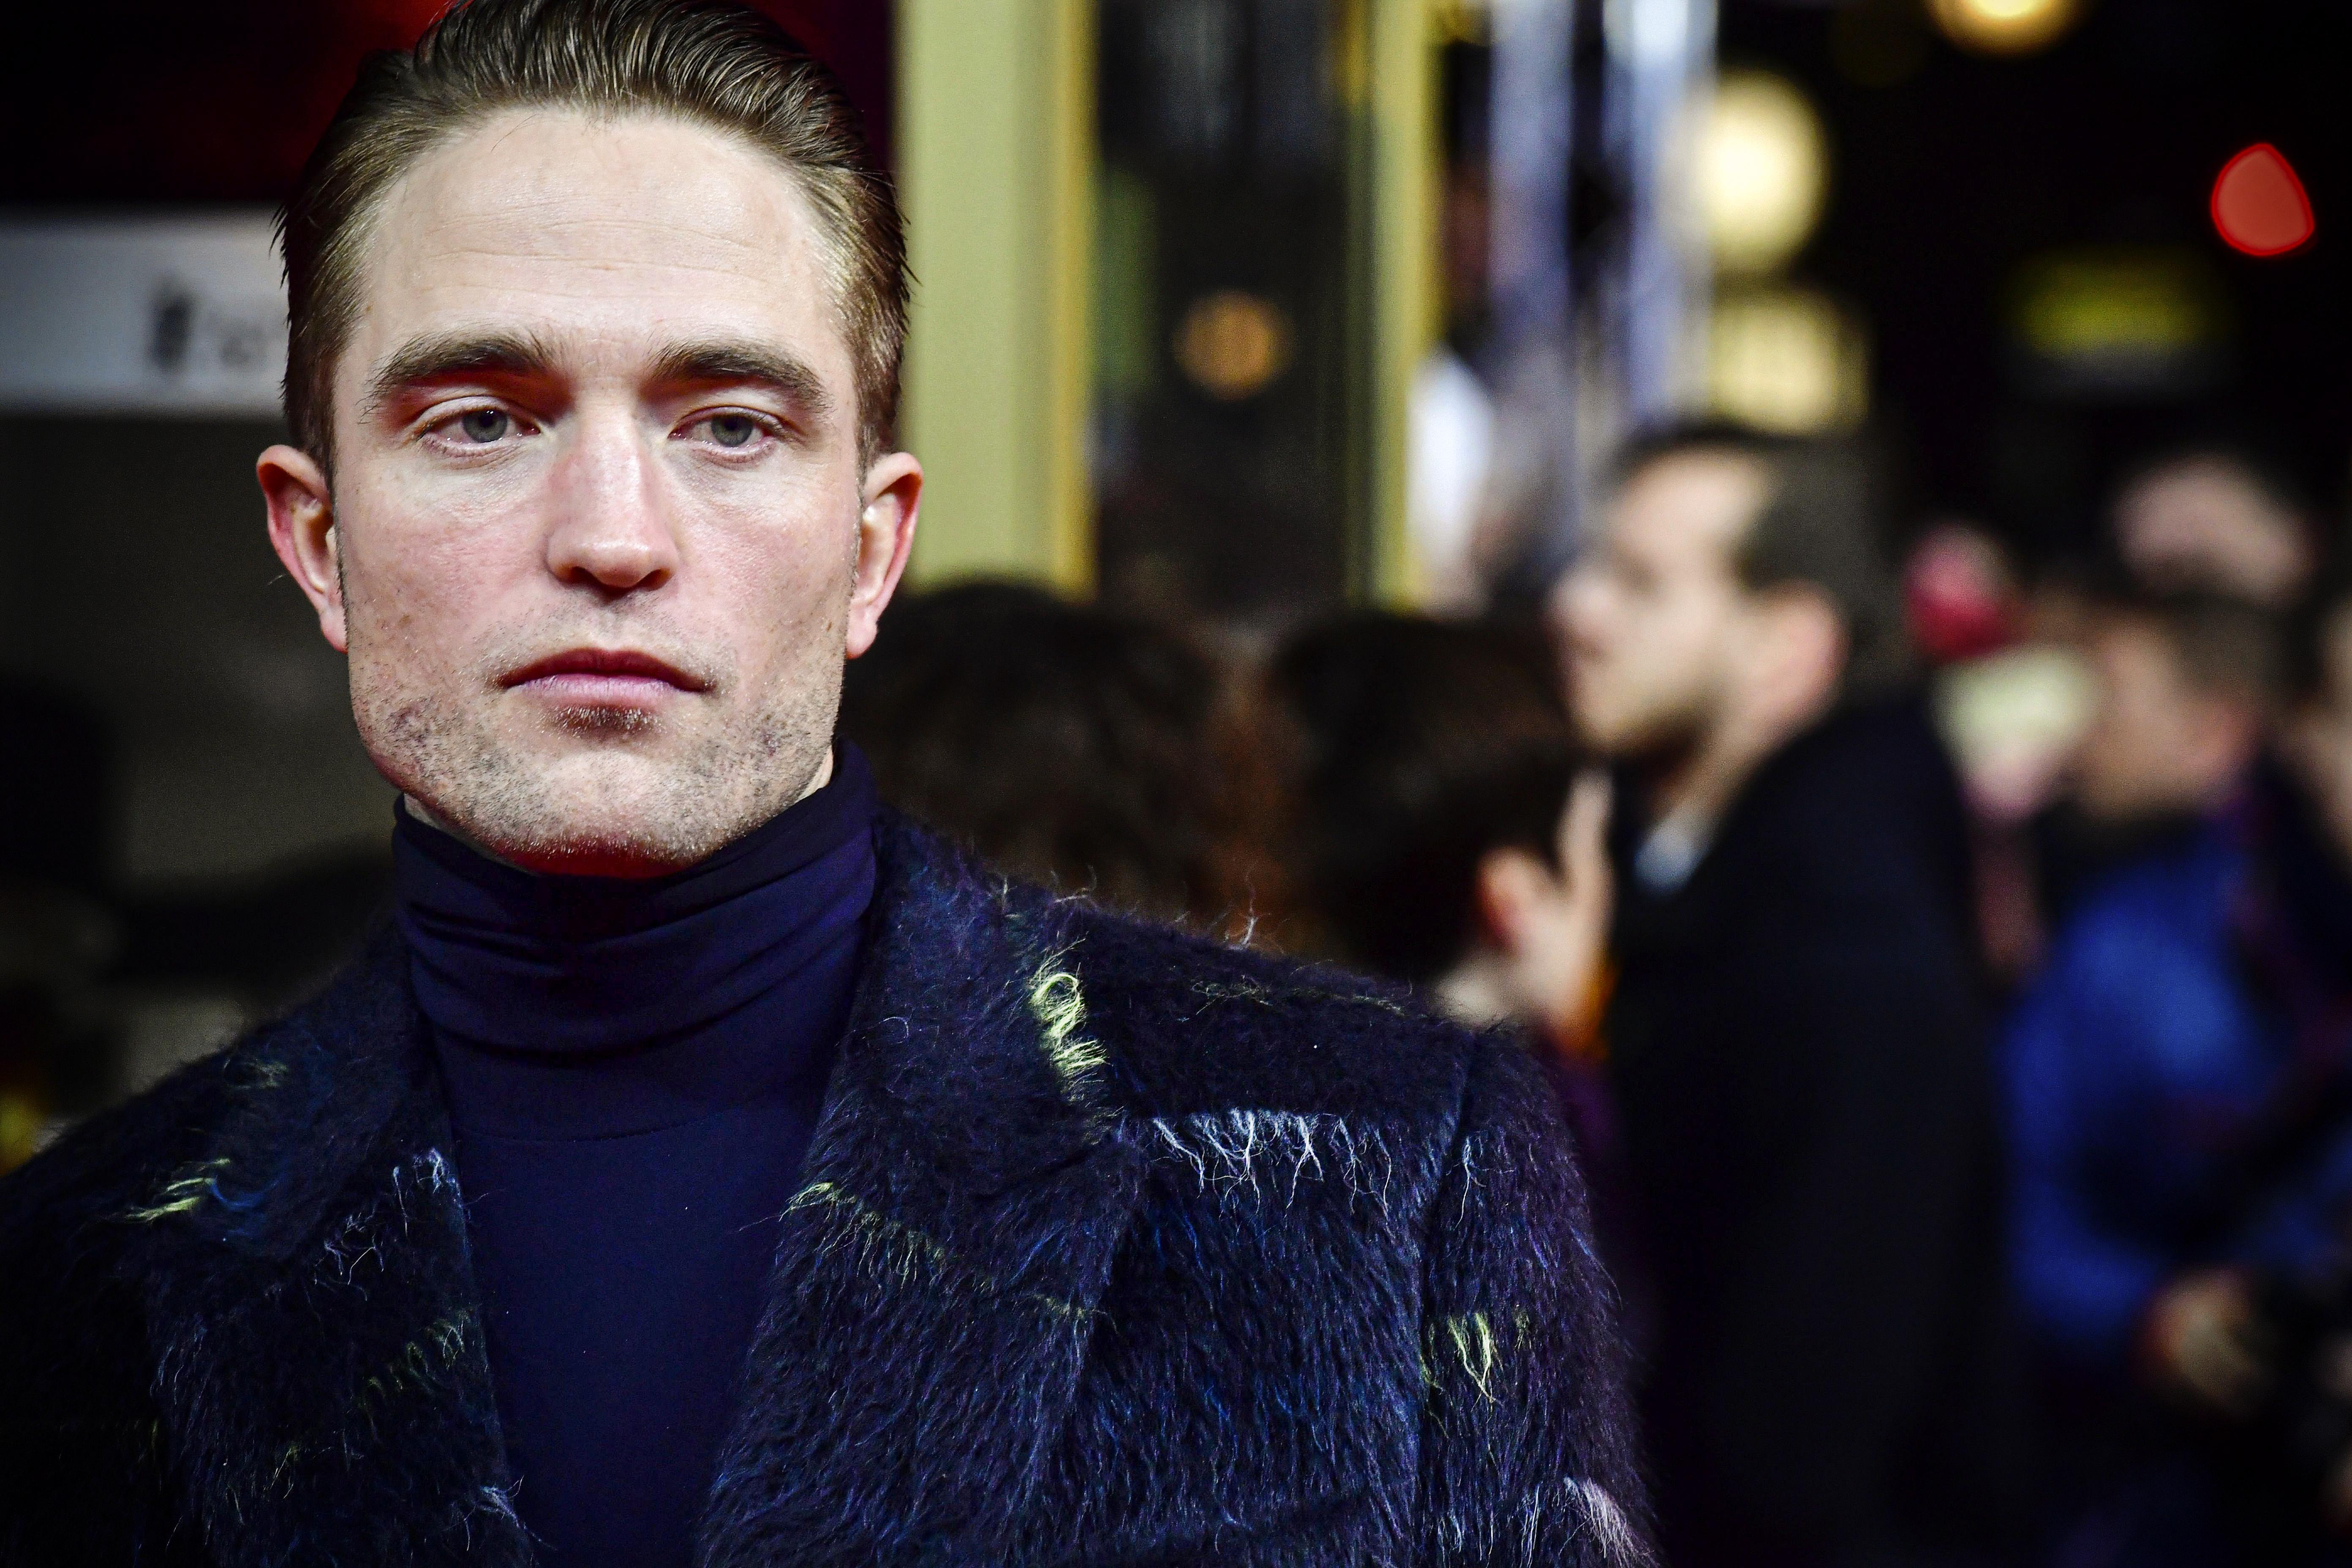 Robert Pattinson on the red carpet.